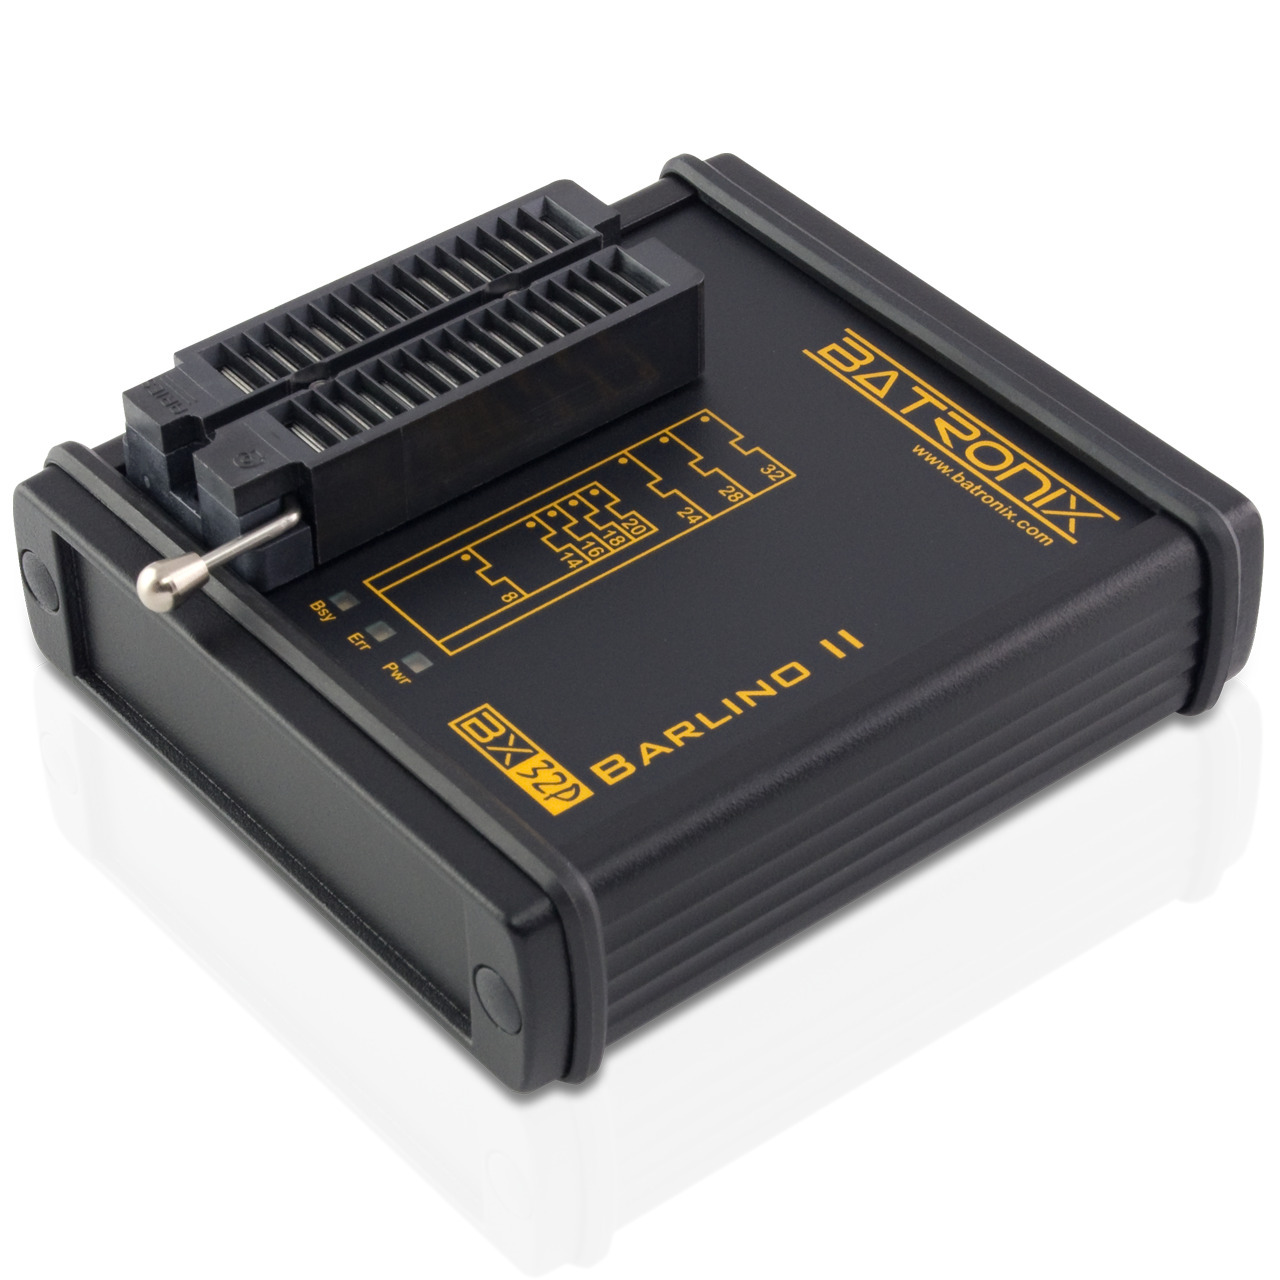 Image of Batronix USB-Universal-Multi-Programmer BX32P